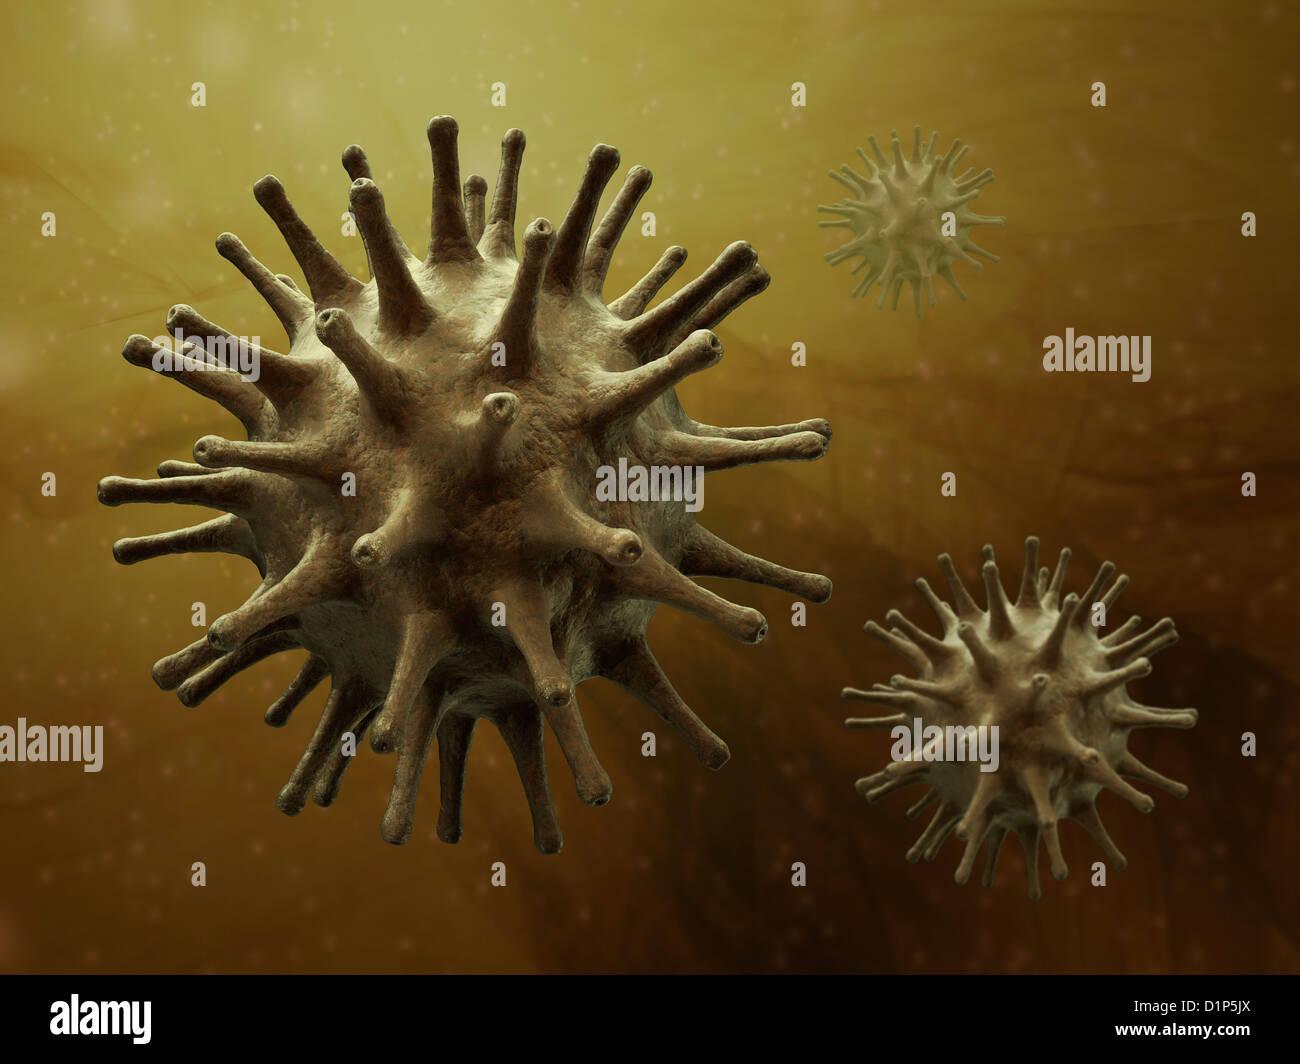 Virus particles, artwork - Stock Image